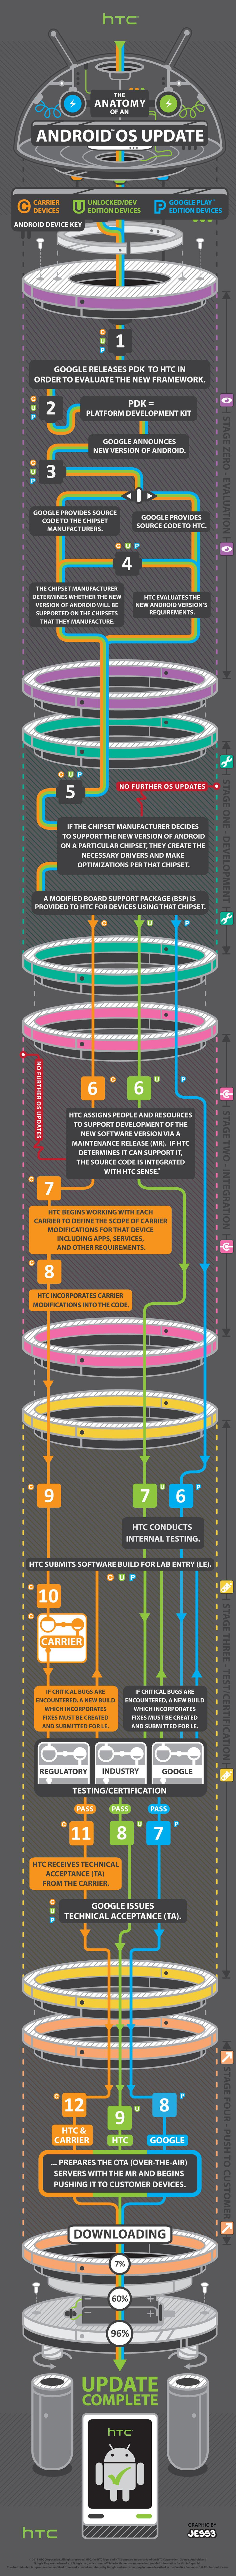 htc-anatomy-of-android-infografik-271213